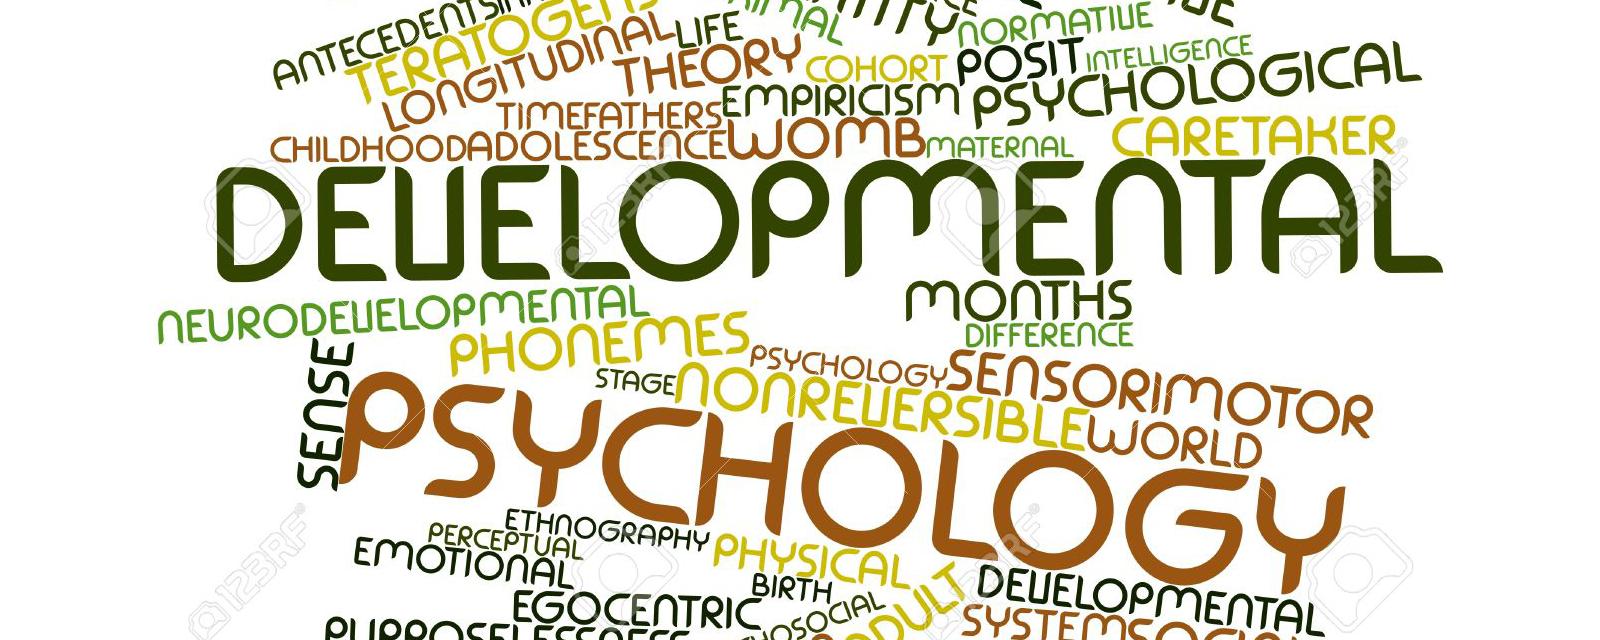 Developmental Psychology and Family Dynamics